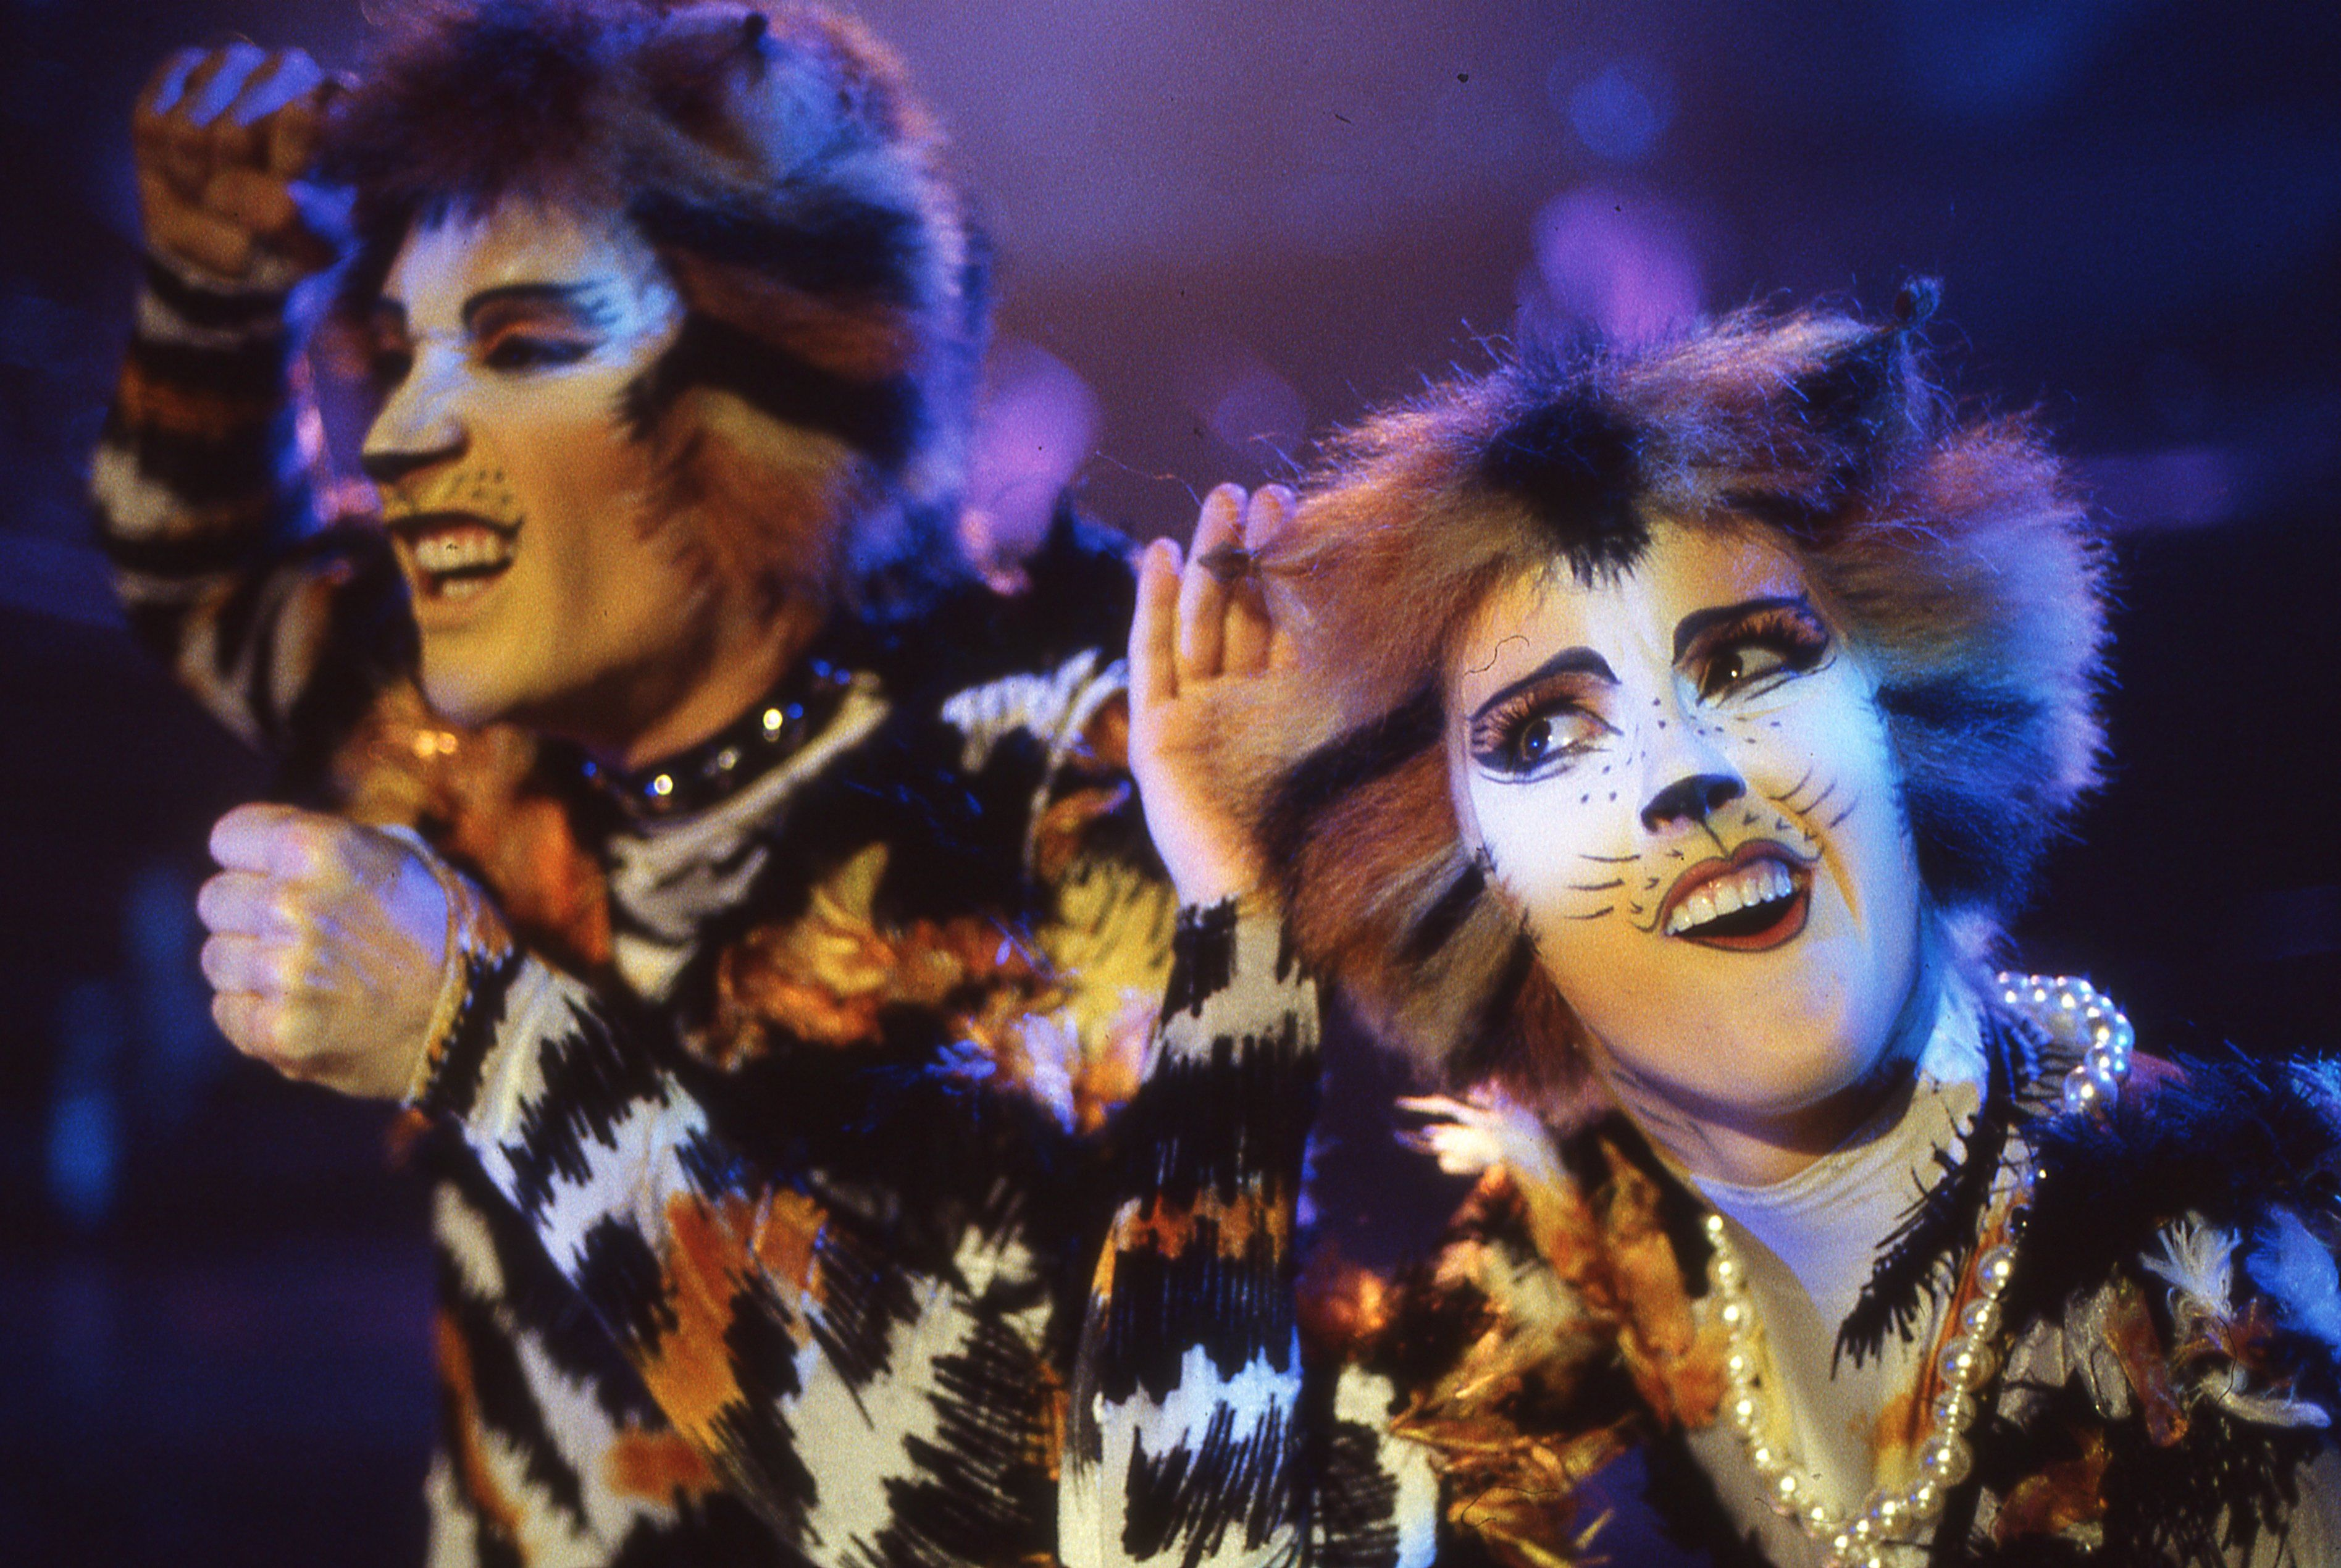 Mungojerrie Rumpelteazer Jellicle Cats Musicals Cats Musical